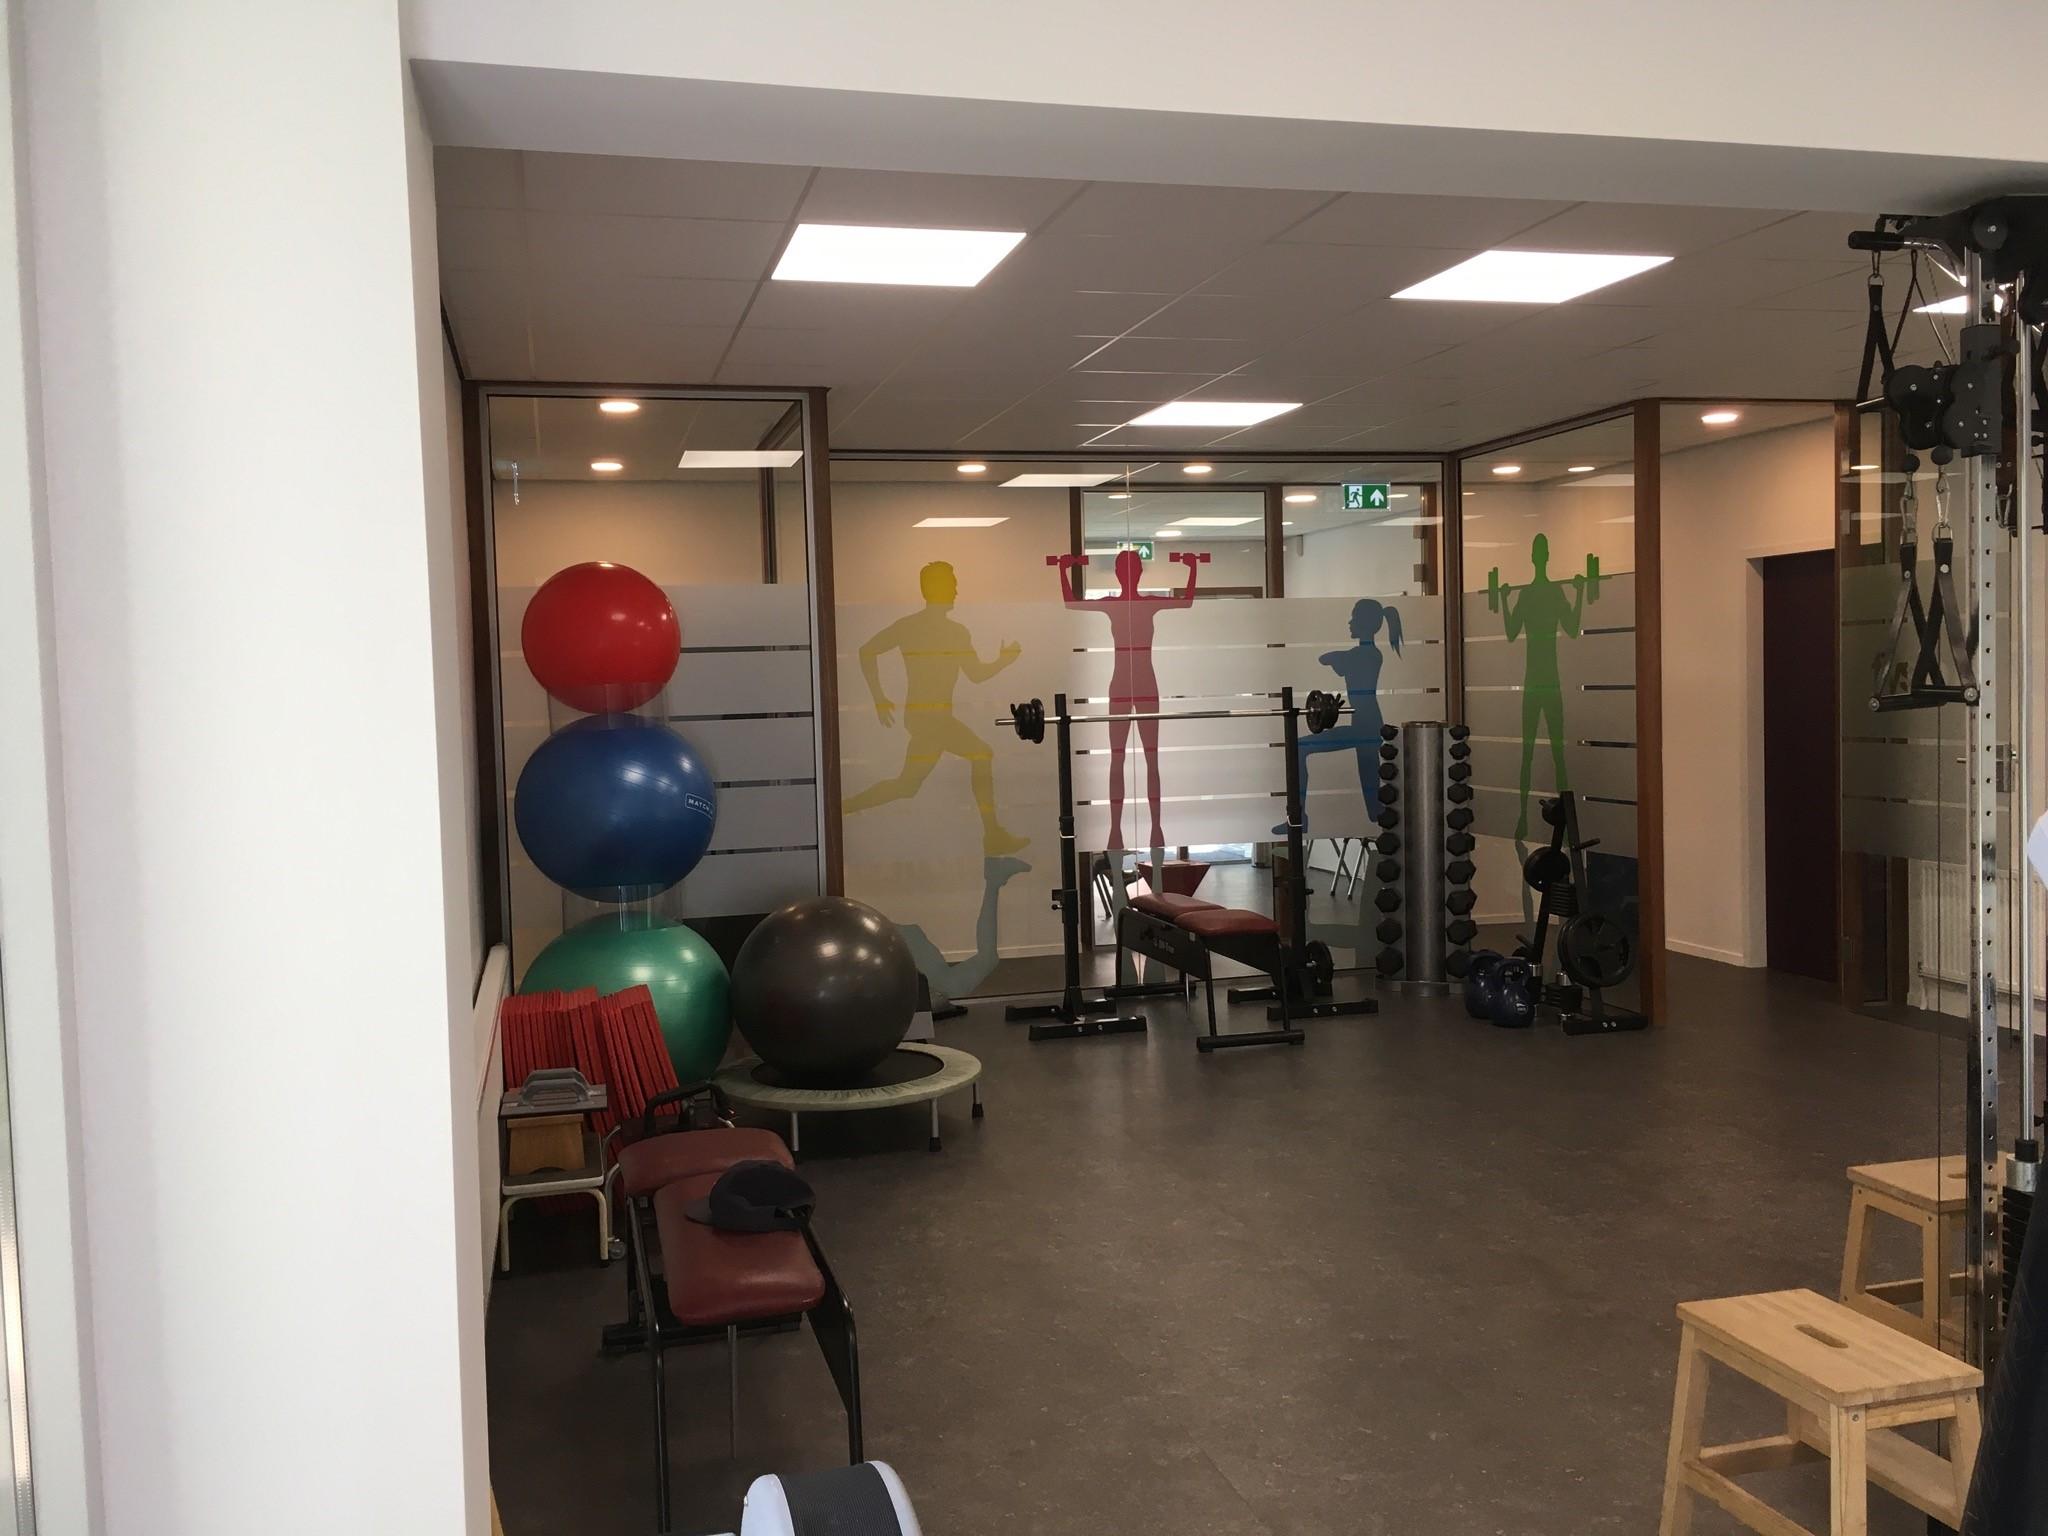 Fysio 4 Bottelroosstraat Selwerd Groningen - oefenruimte fysiotherapie 1